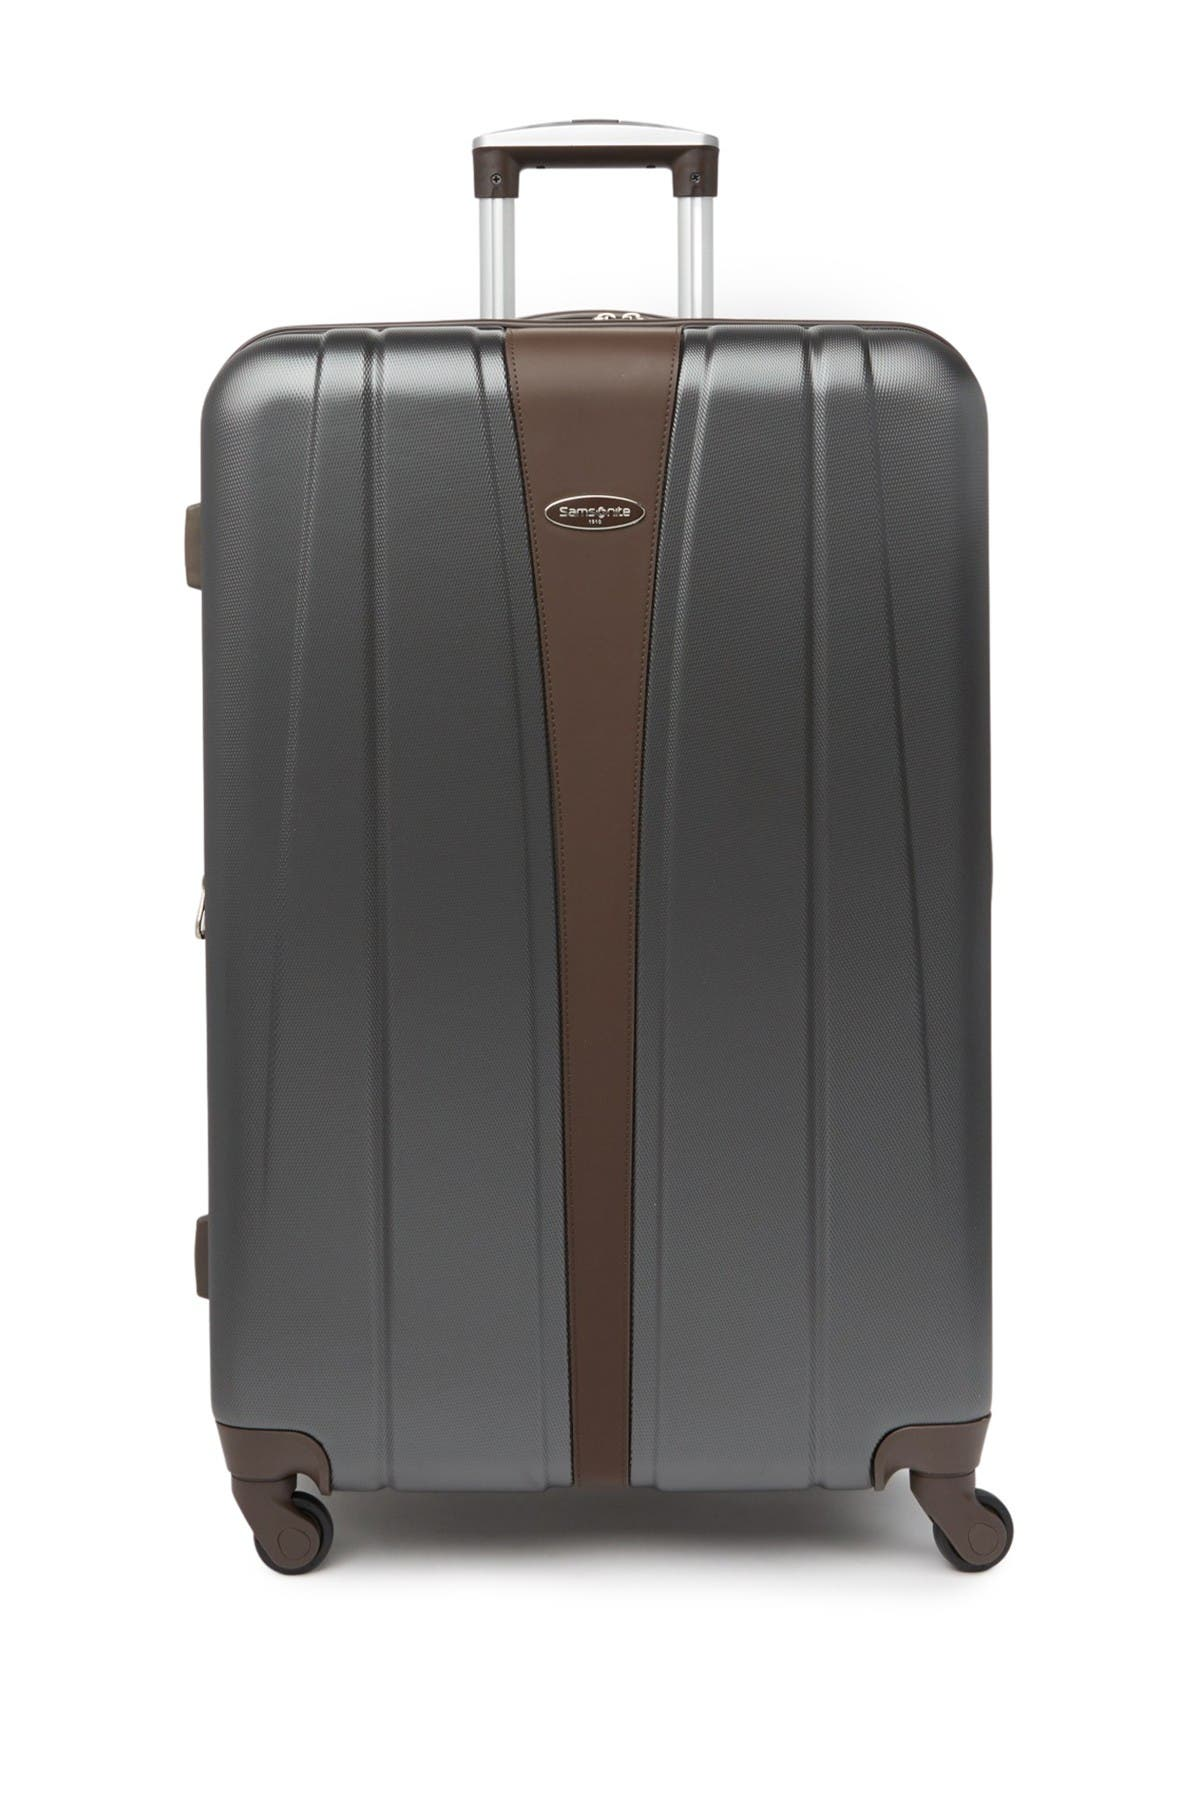 "Image of Samsonite 28"" Spinner Luggage"